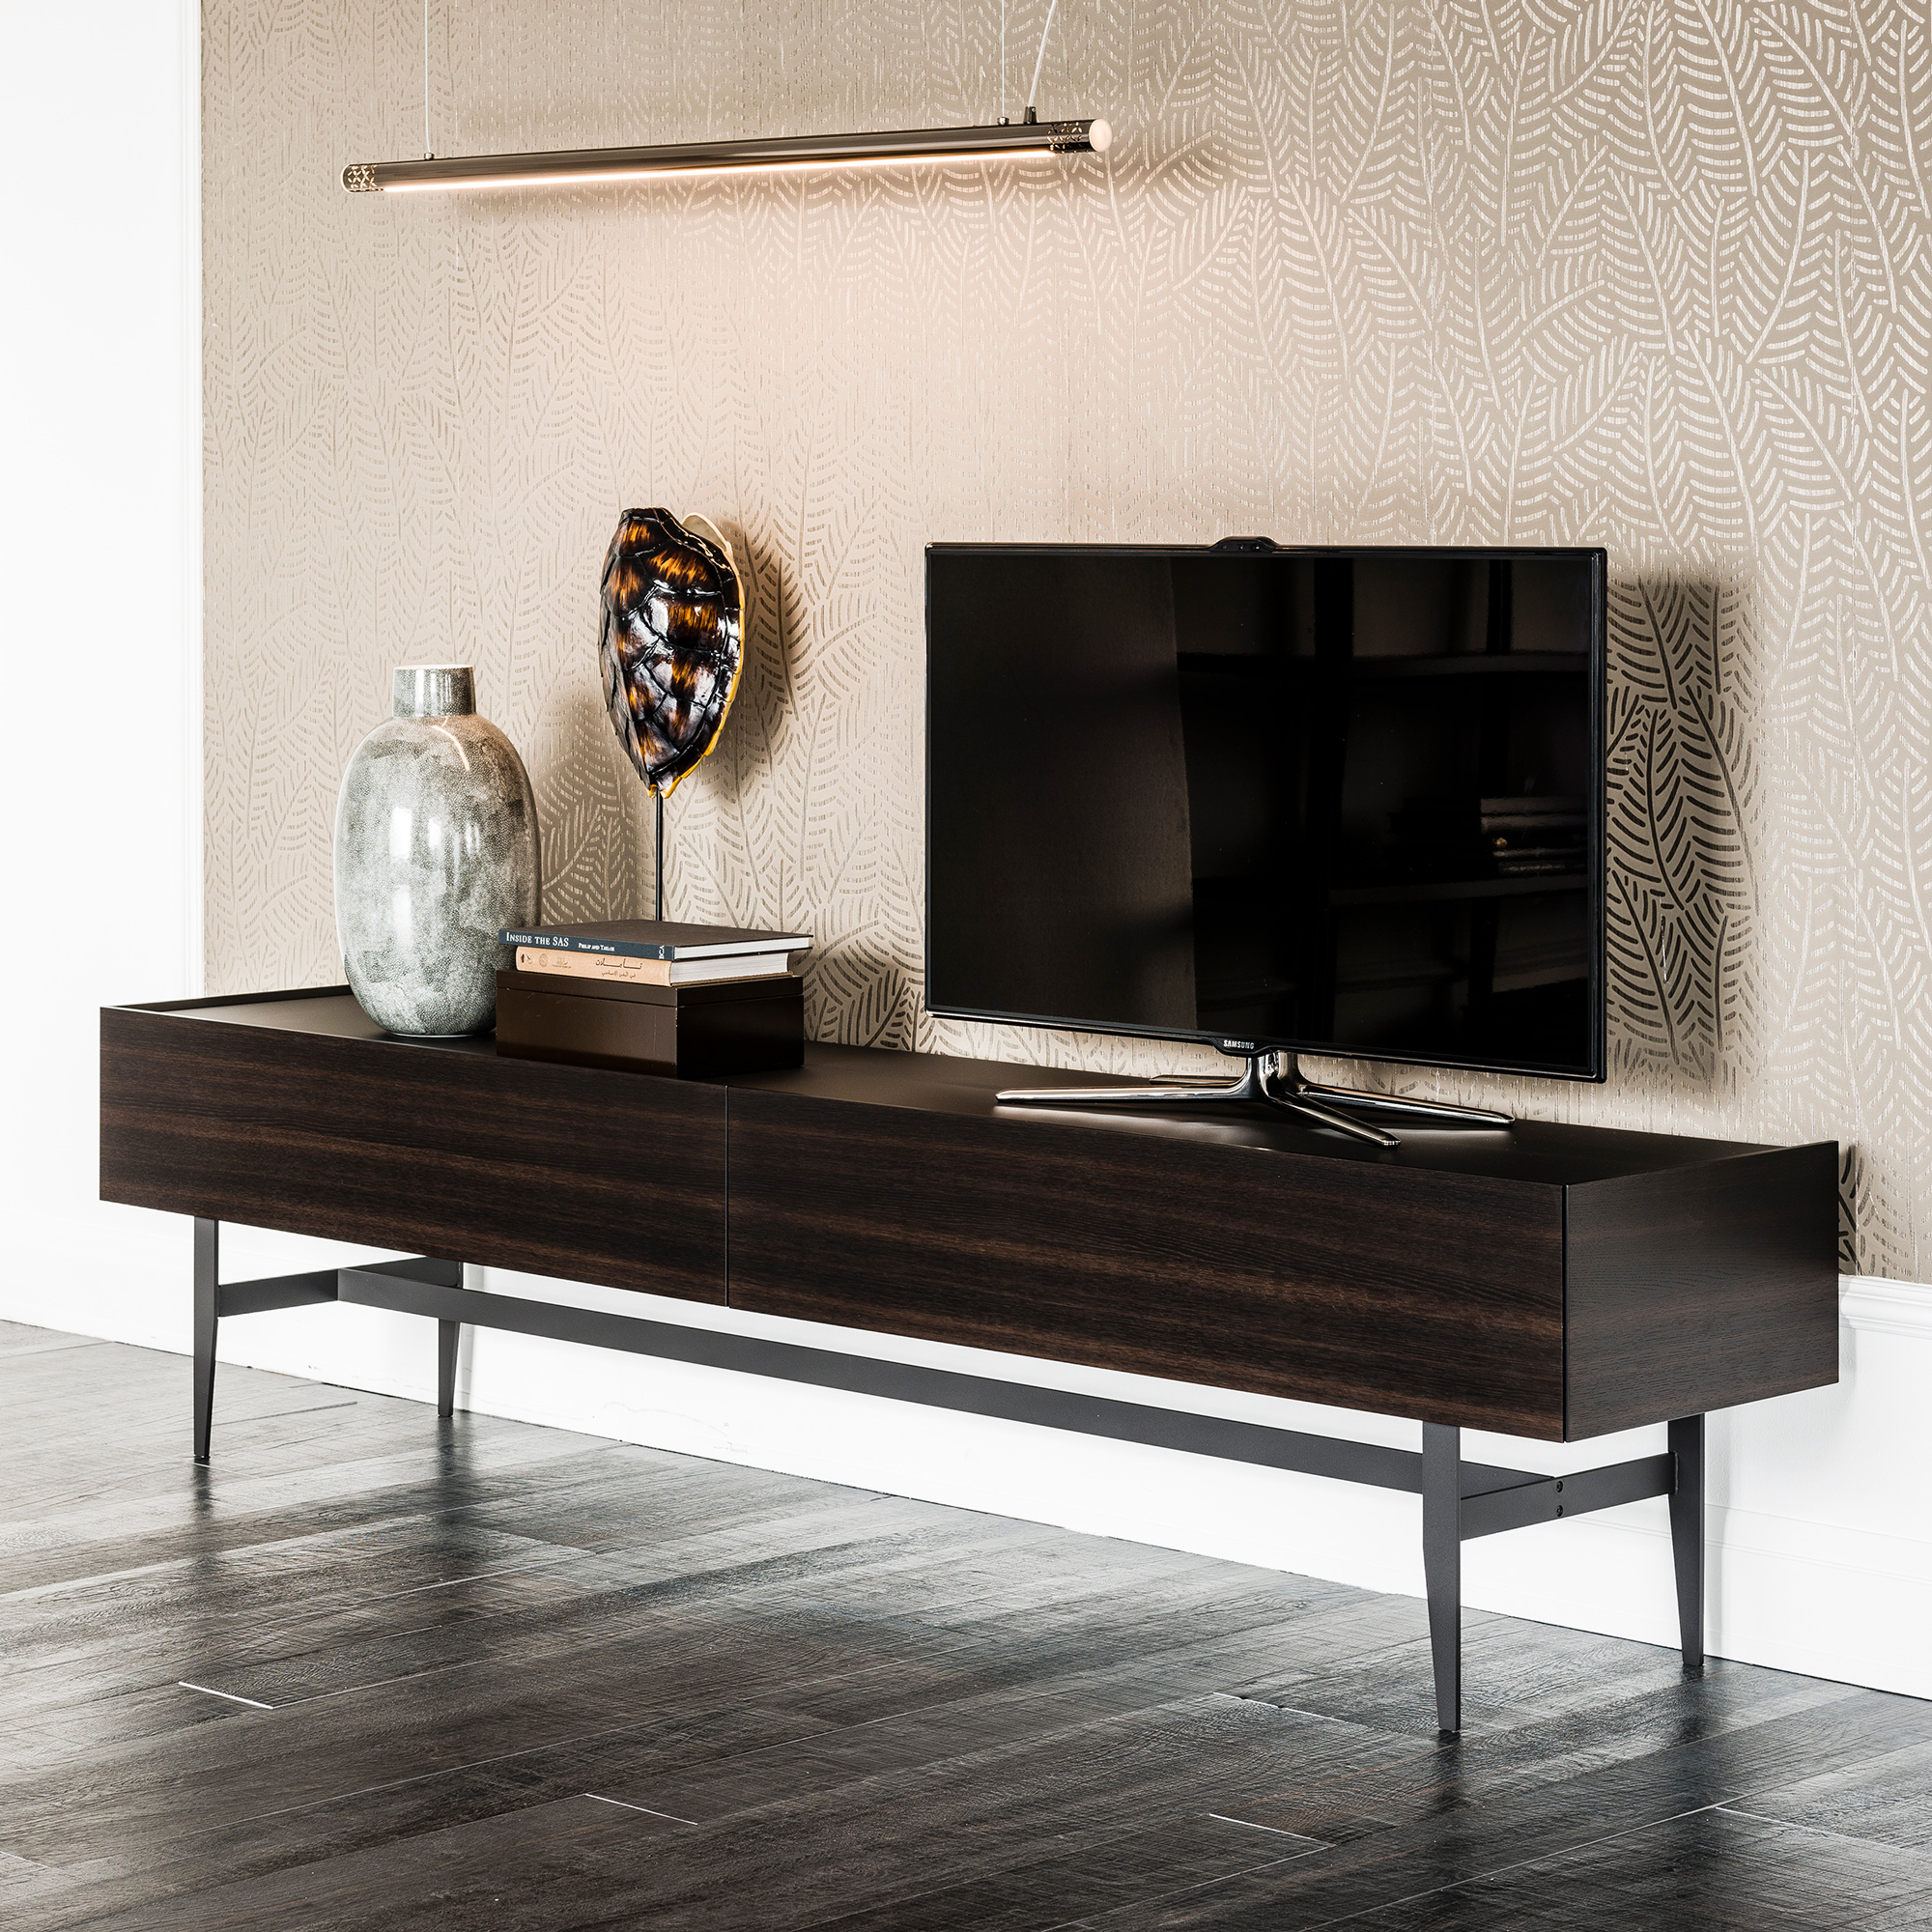 Luxury Horizon Italian Designer TV Stand - Italian ...